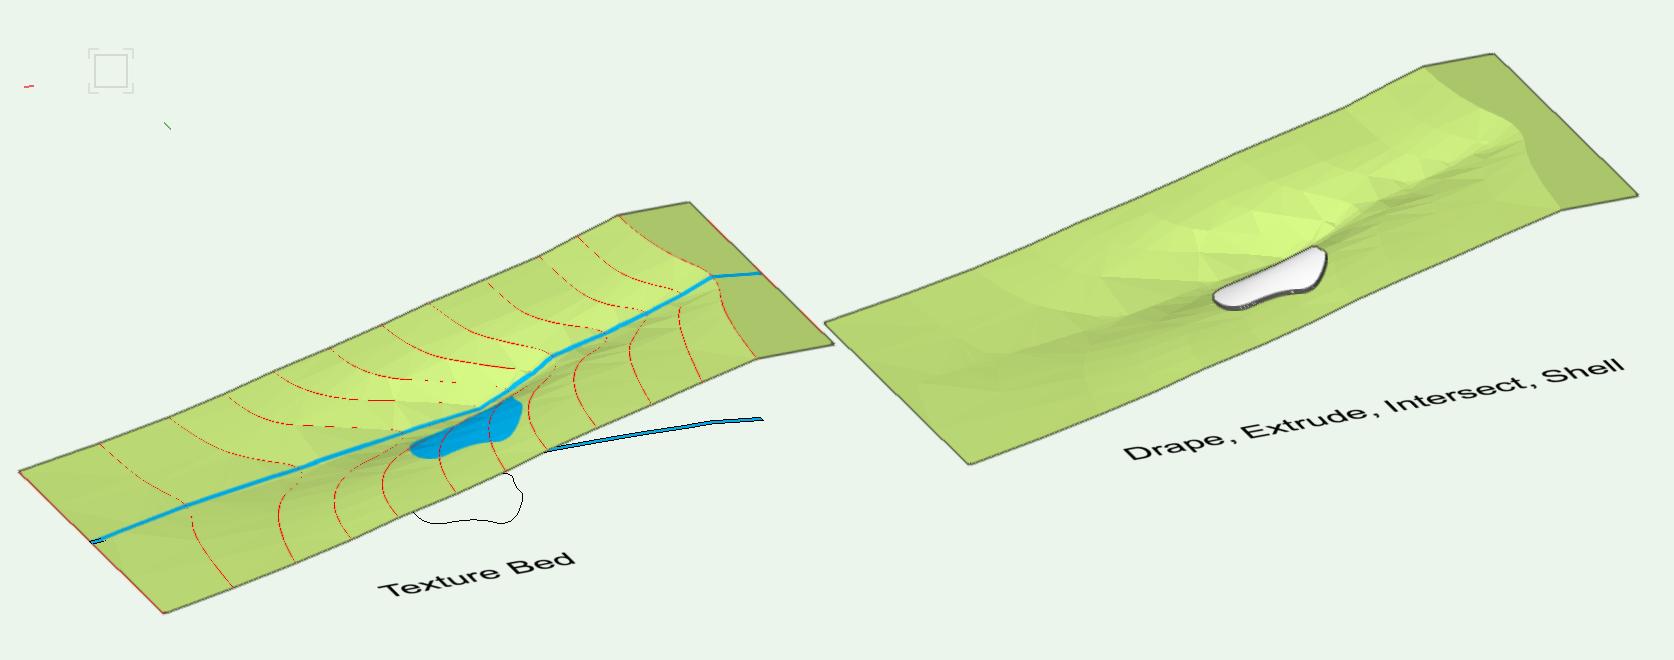 Terrains.png